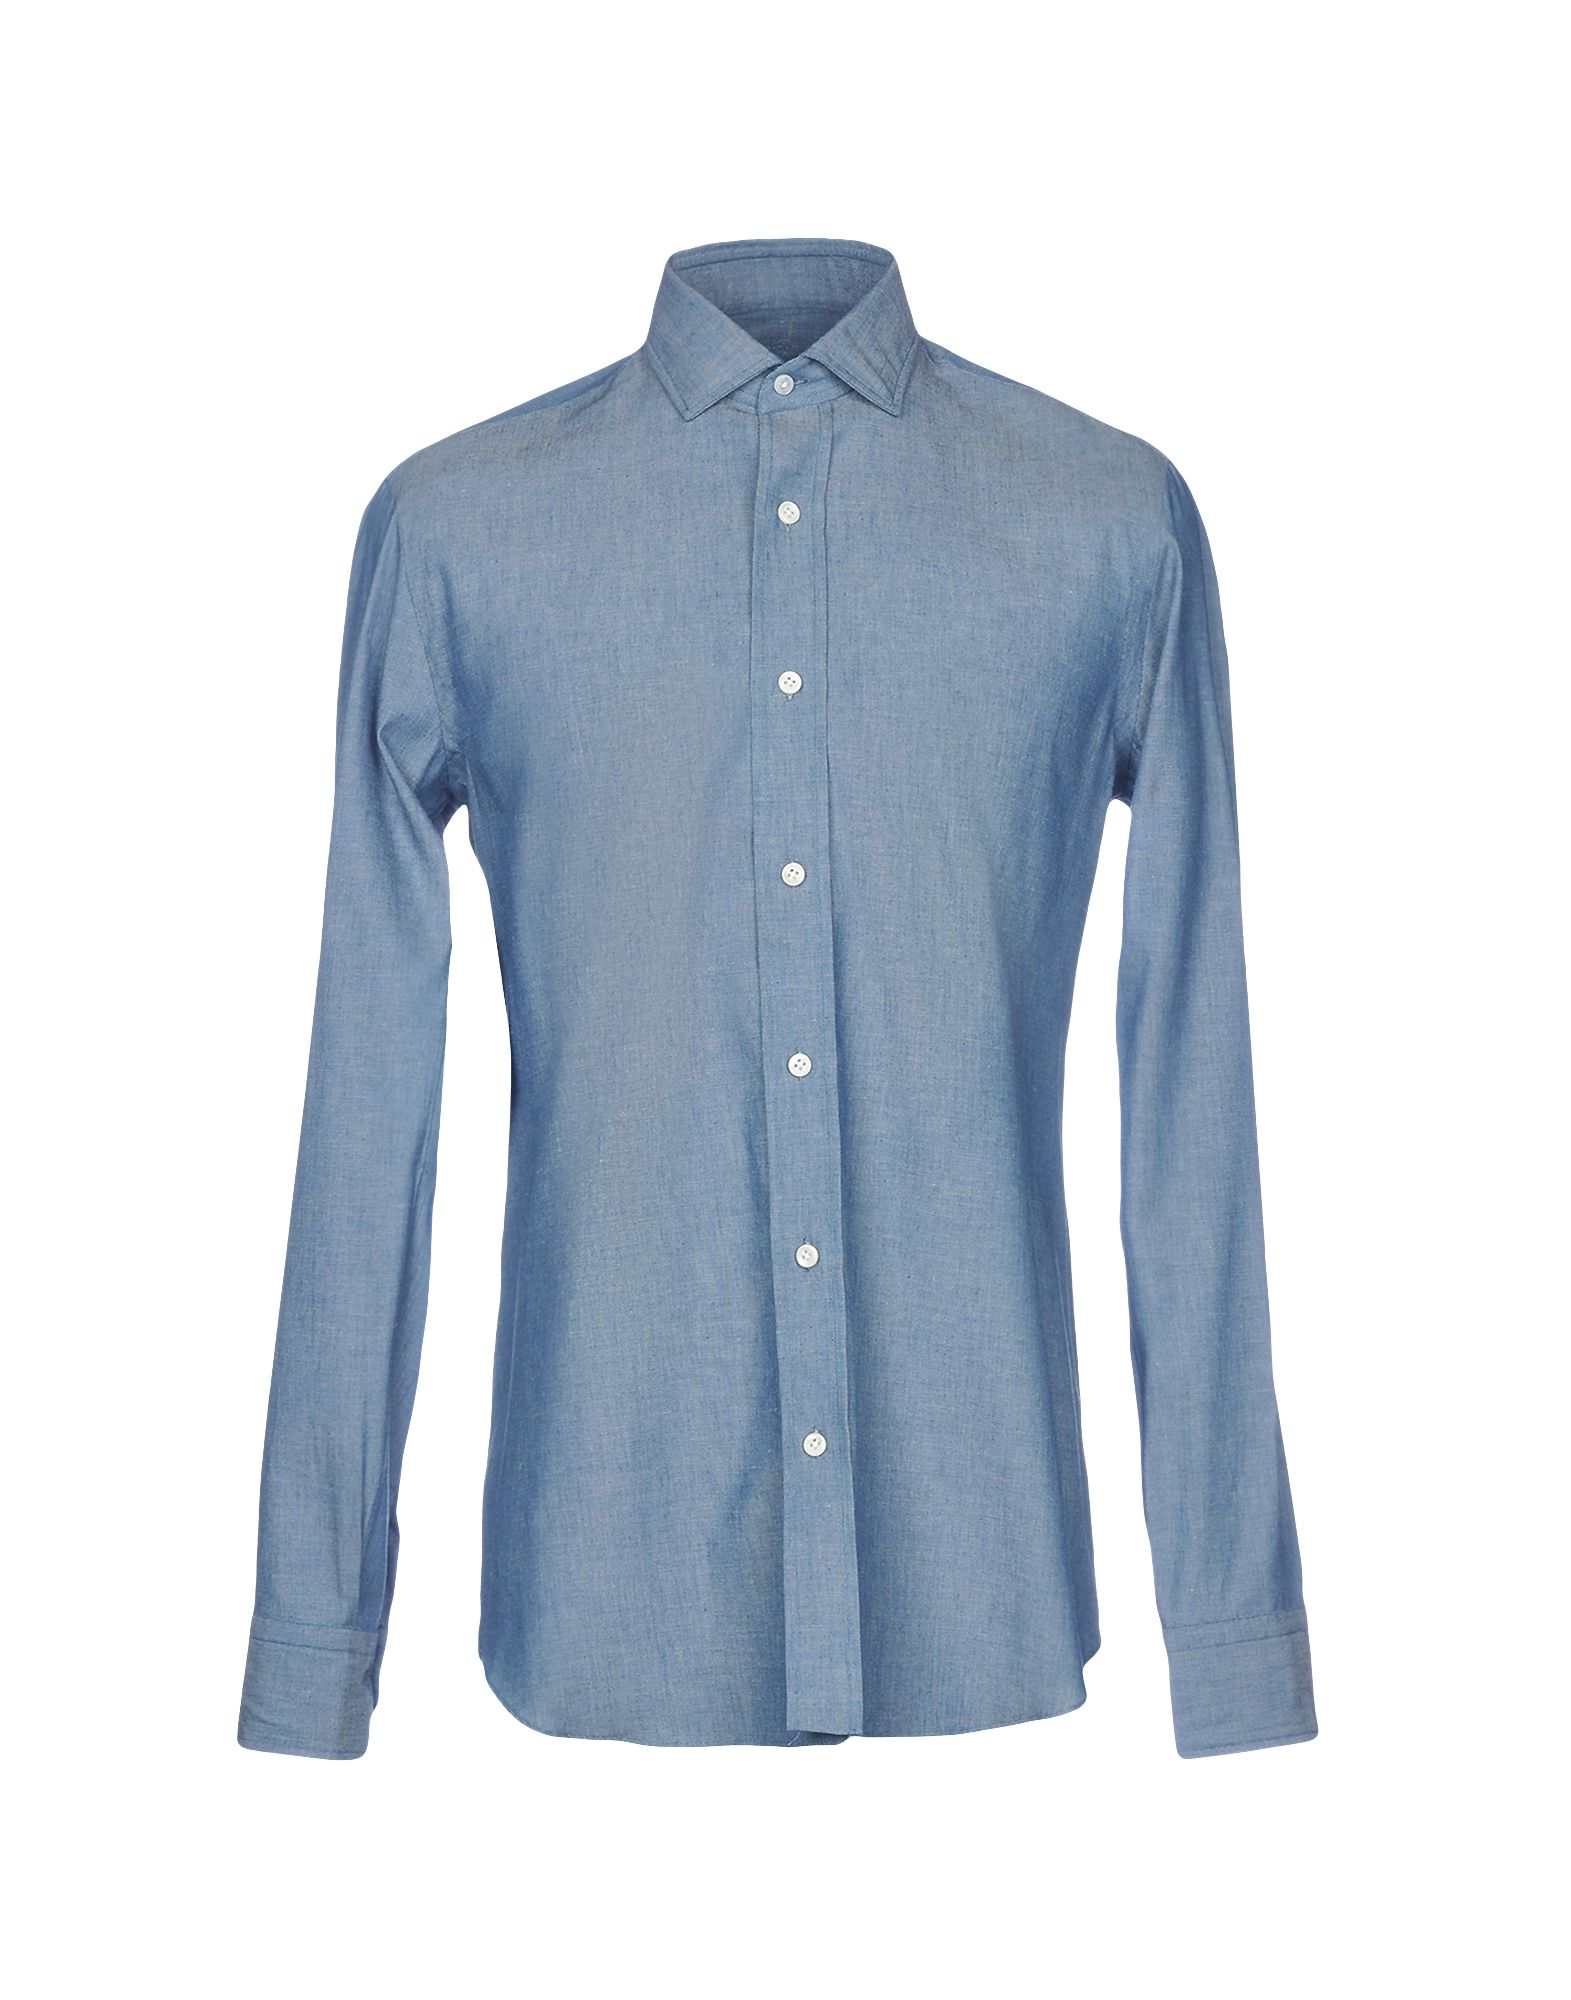 SALVATORE PICCOLO Solid Color Shirt in Blue